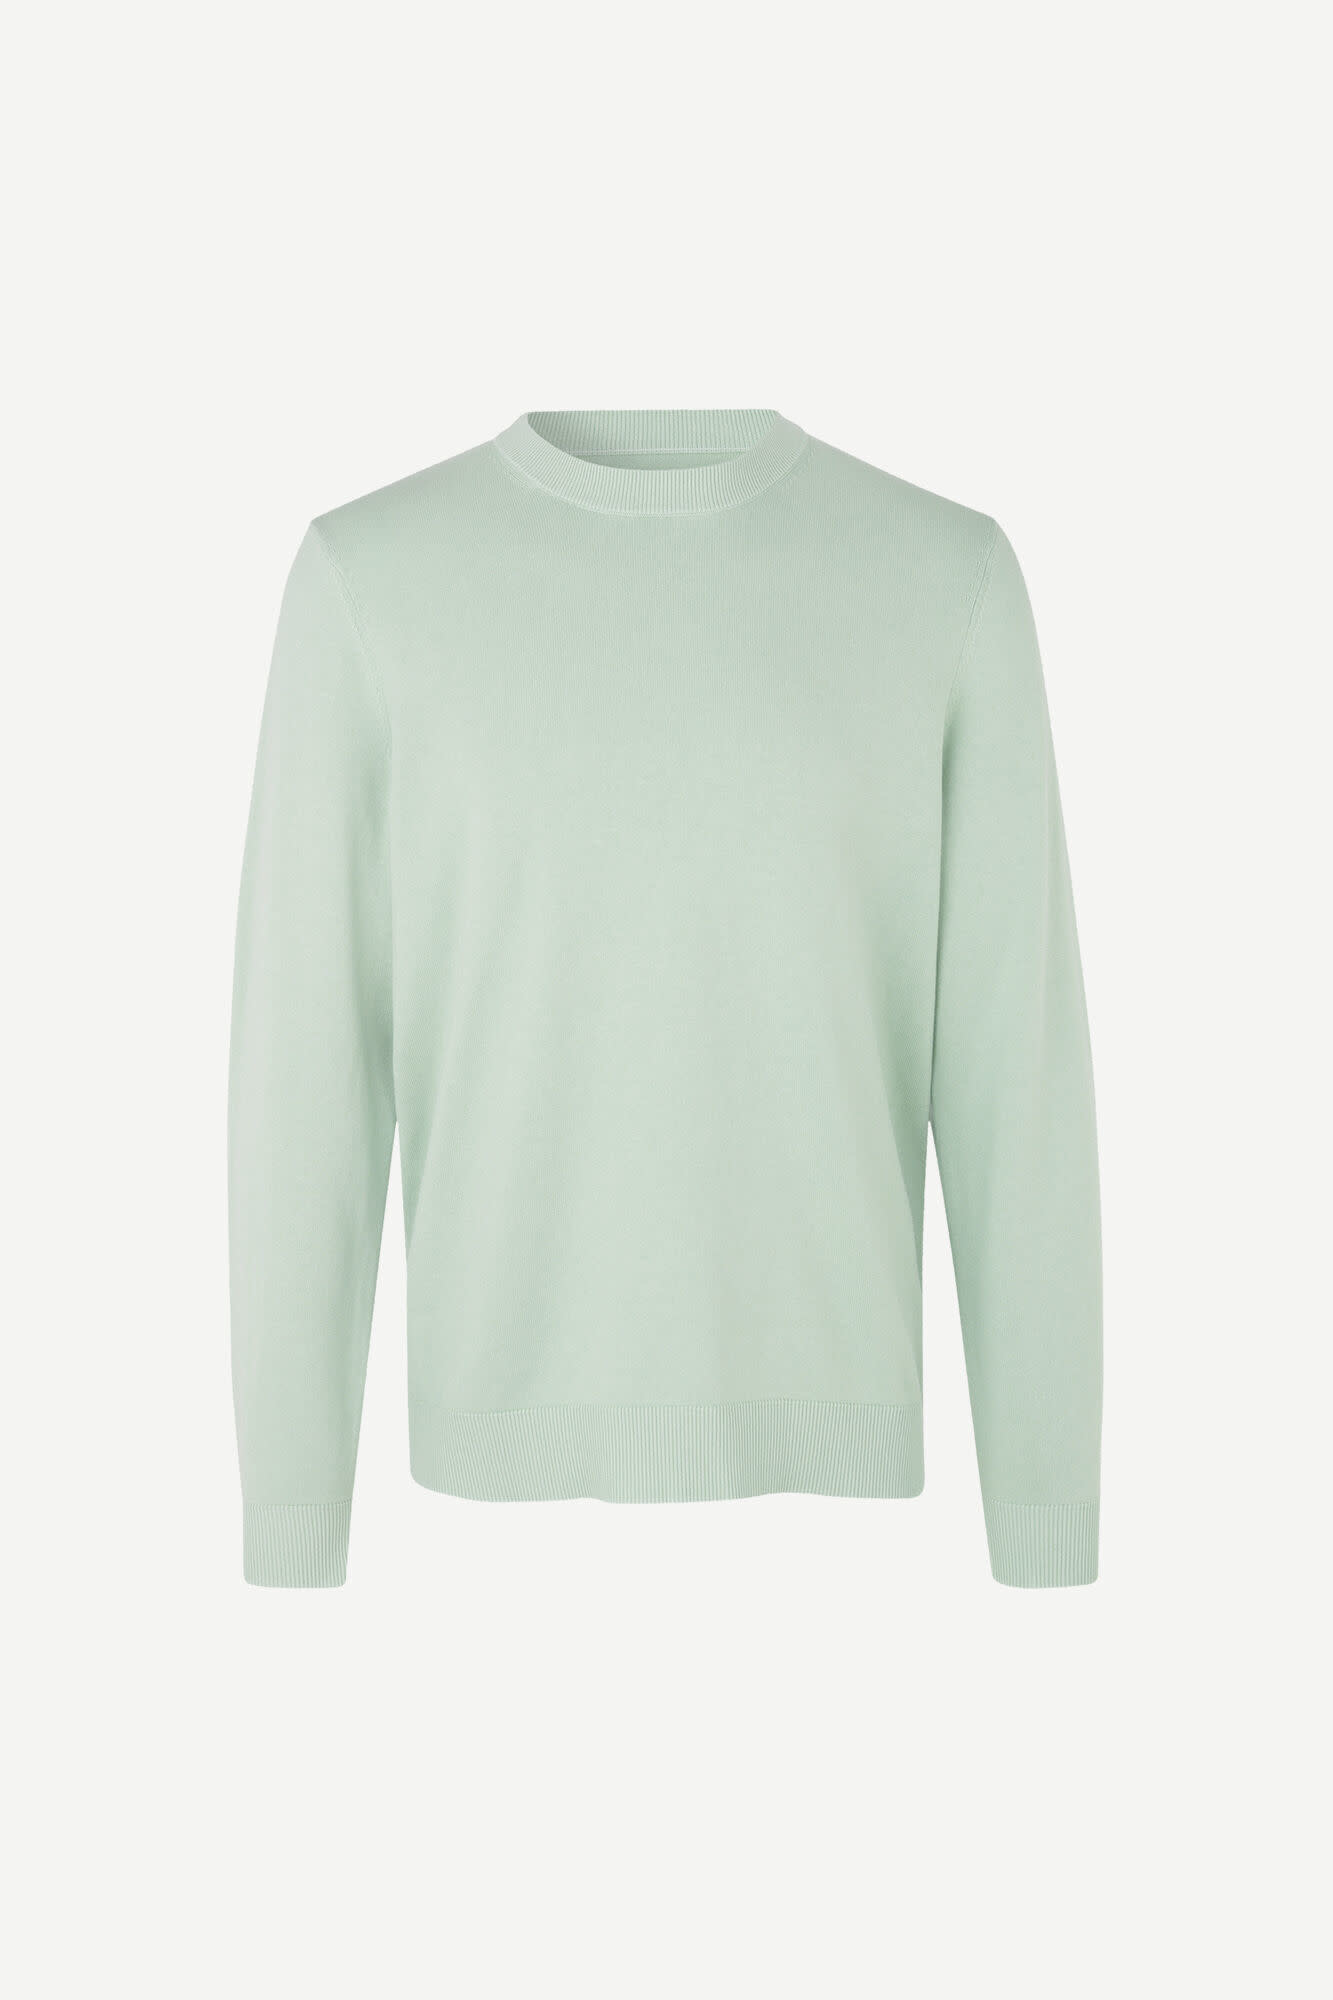 Ferris Frosty Green Crew Neck Sweatshirt-3